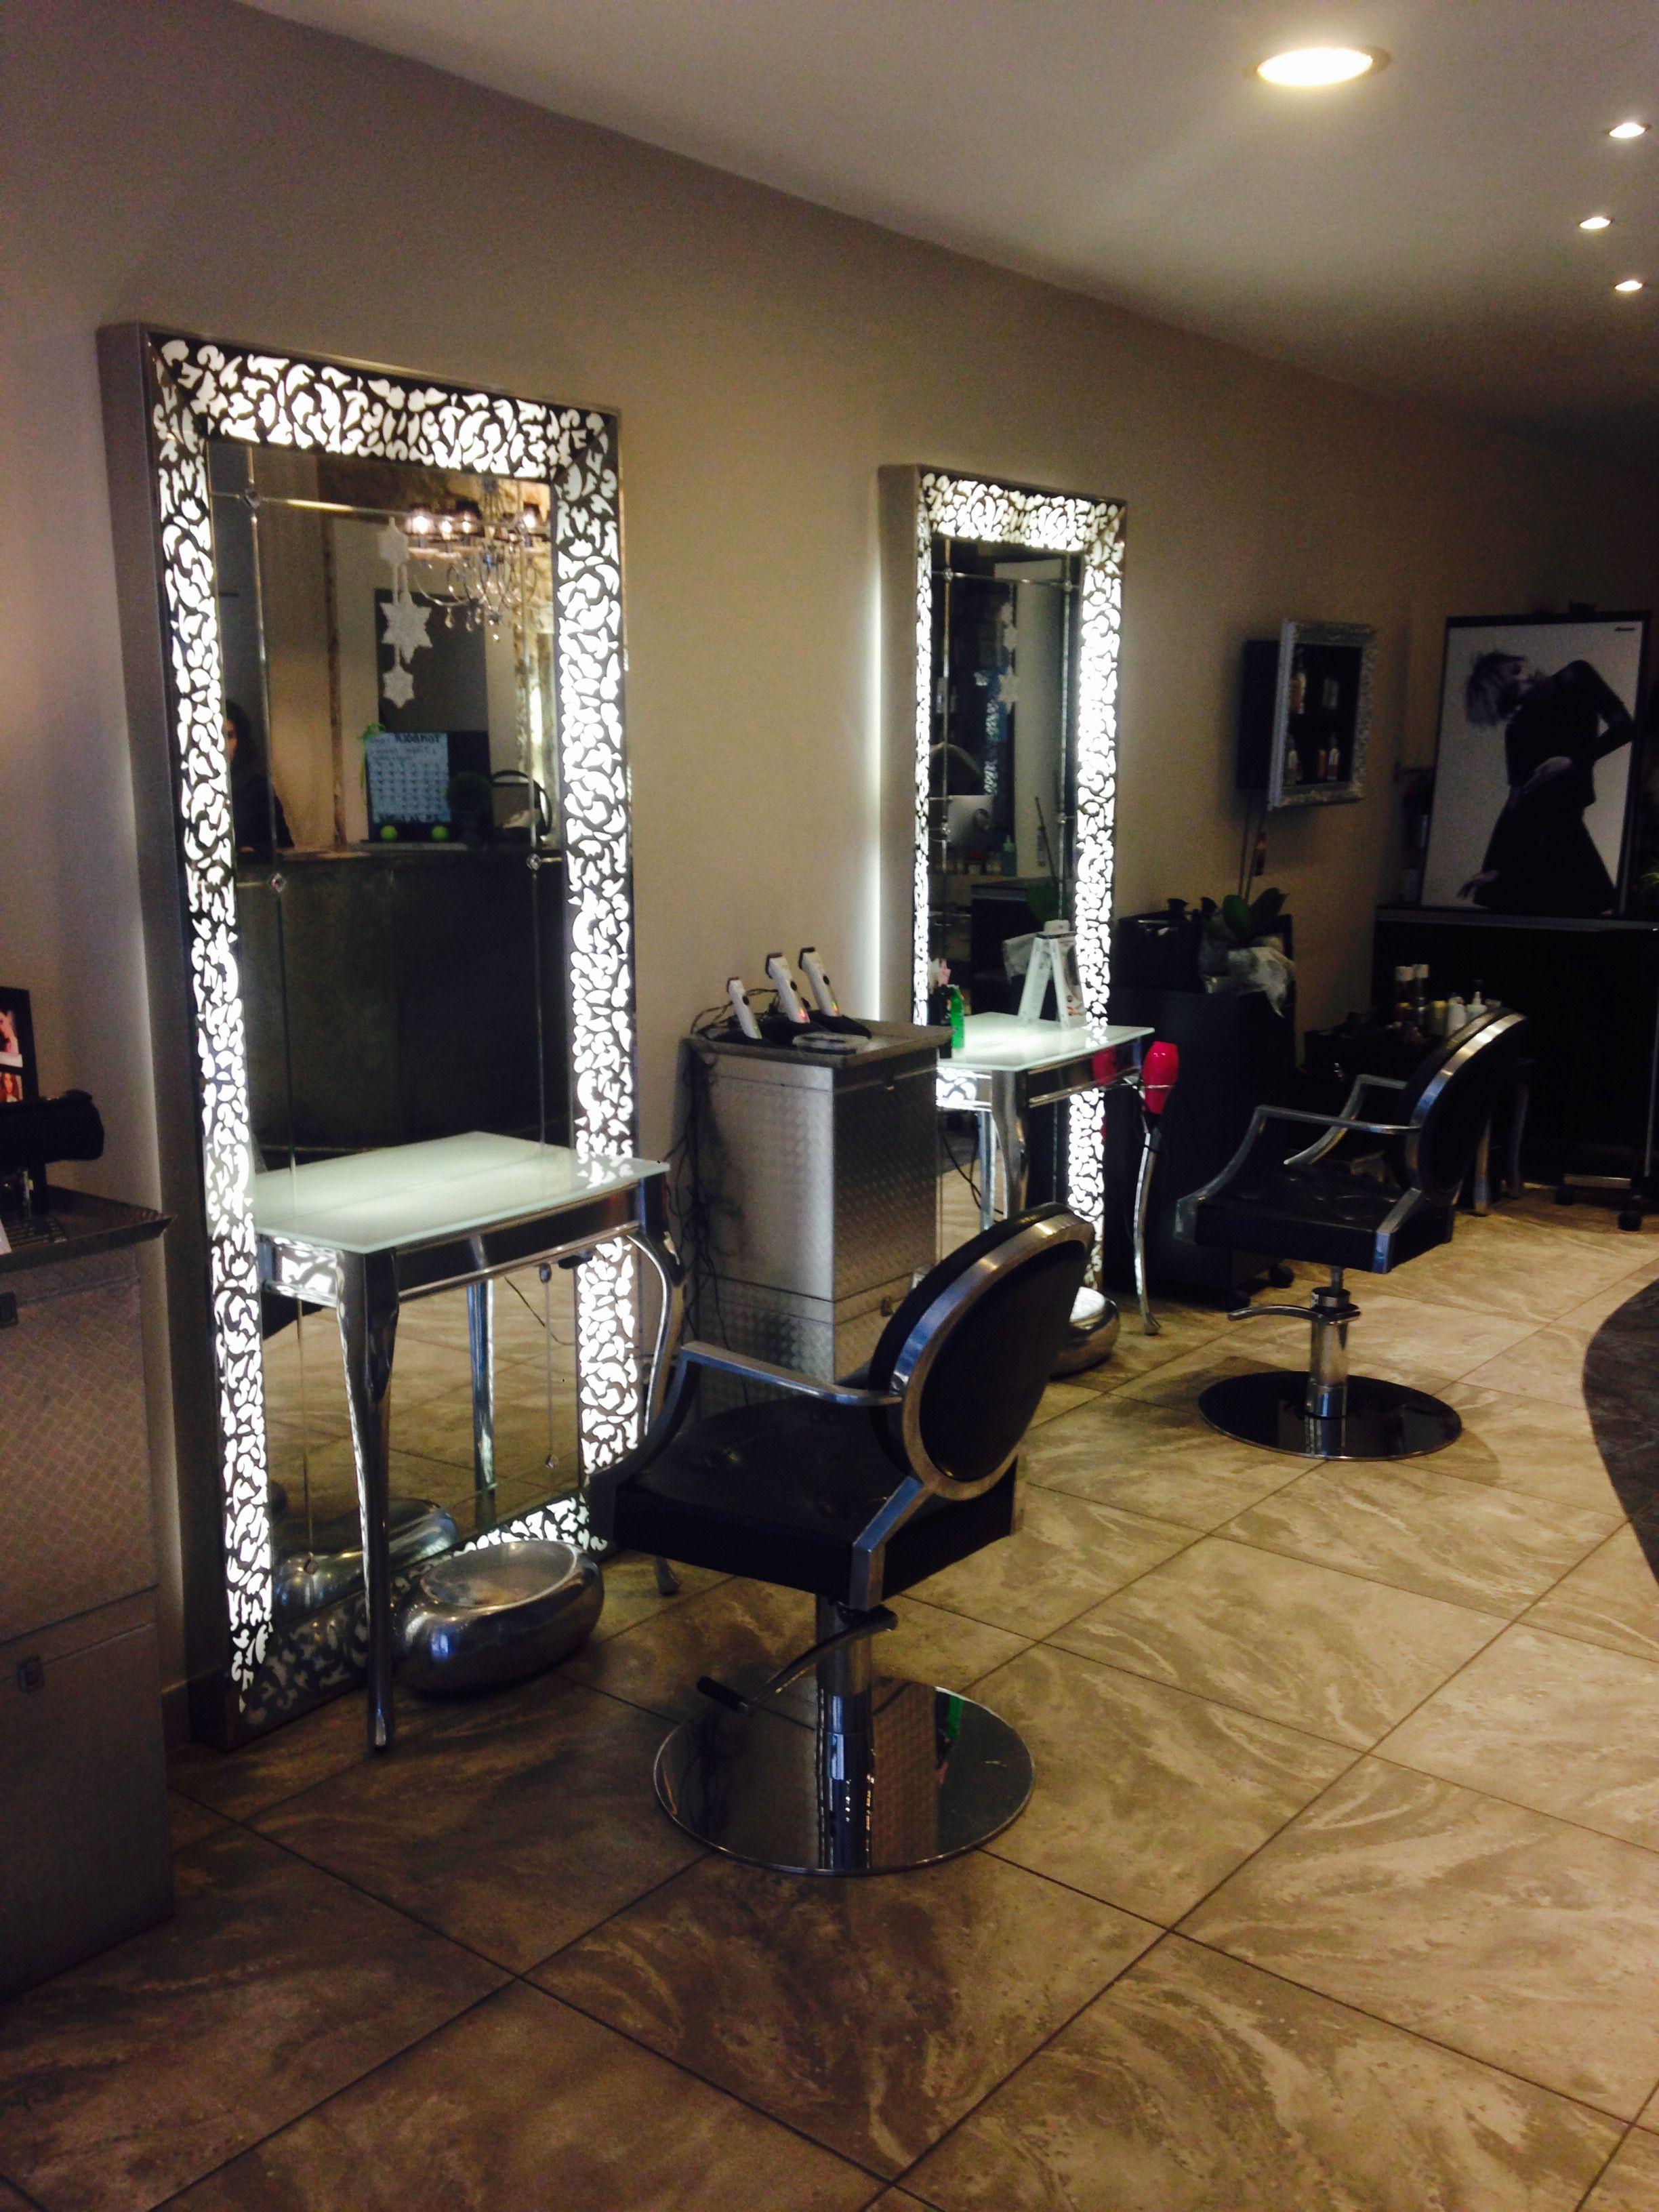 18+ Vente salon de coiffure inspiration